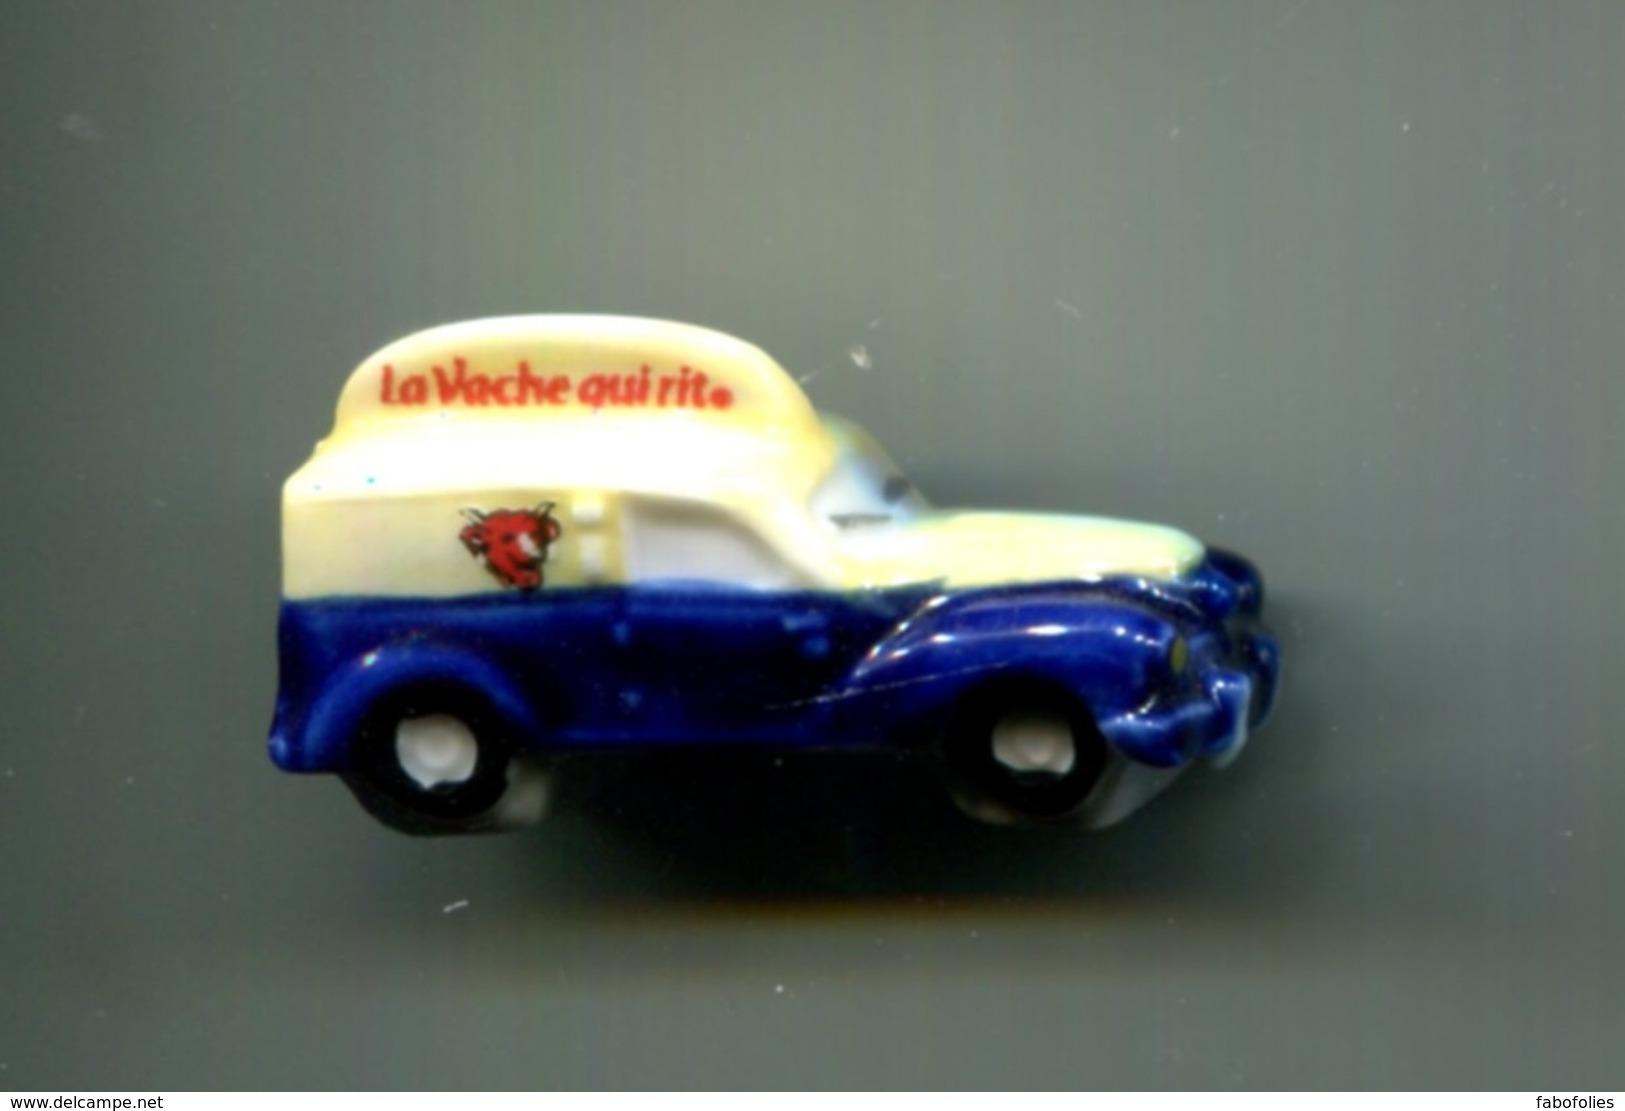 Feve A L Unite Vehicules Vache Qui Rit N9 / 1.0p18d5 - Other